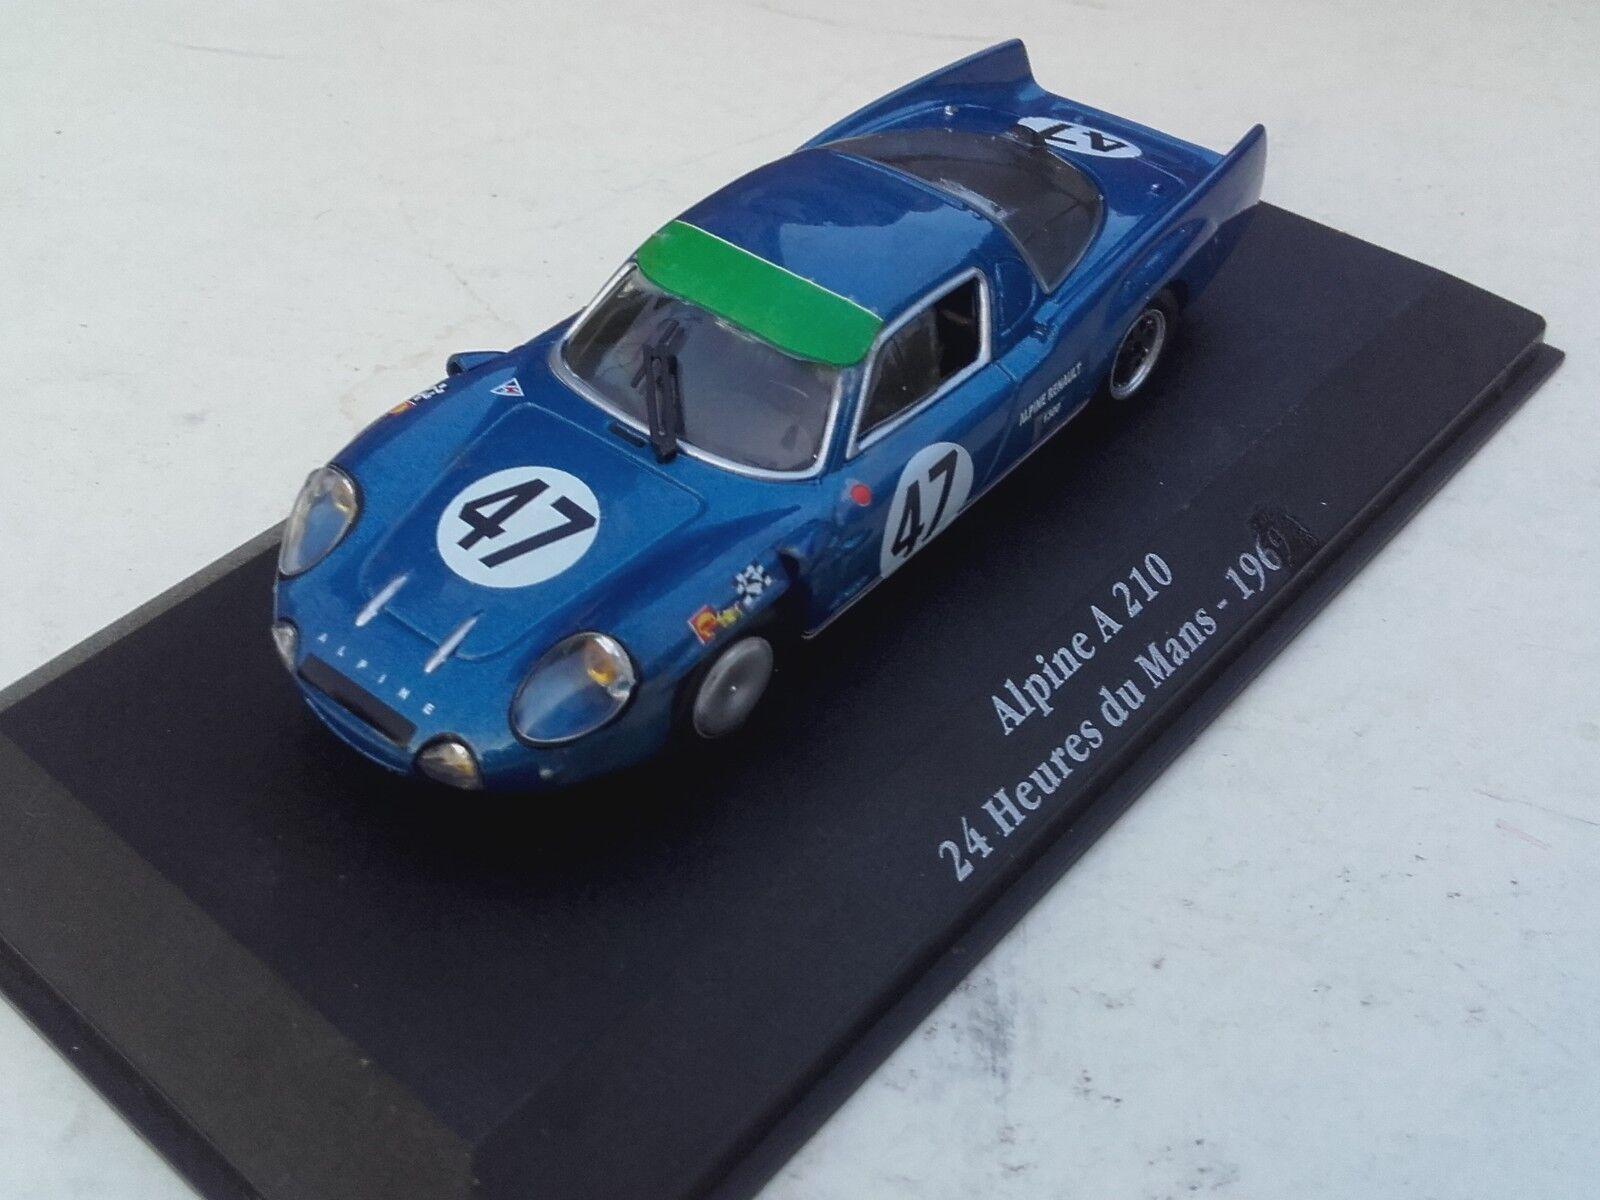 Alpine a210 n 47 24 hours of le mans 1967 1 43 surrender